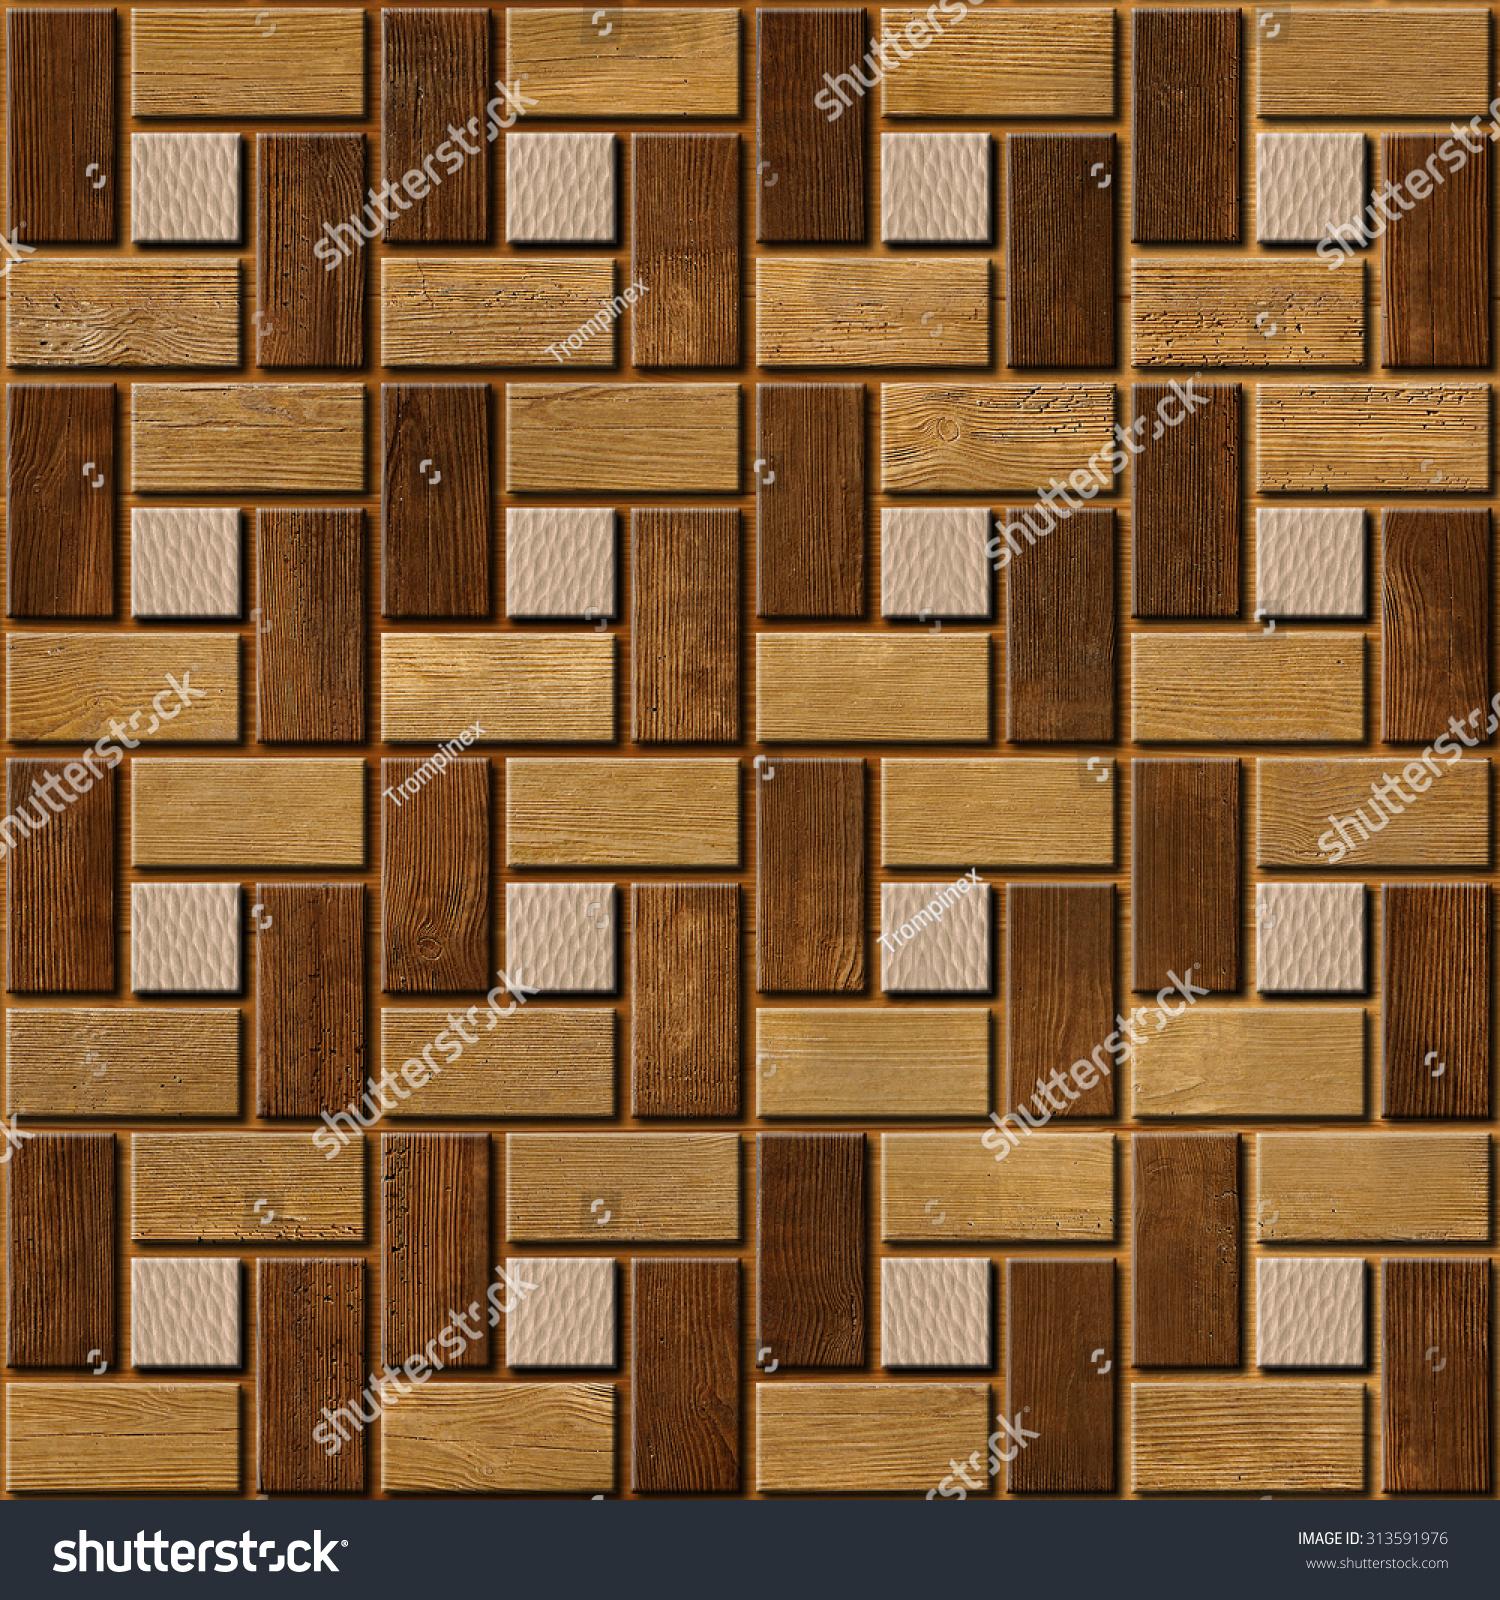 Decorative wooden parquet interior wall panel pattern - Architectural wood interior wall panels ...